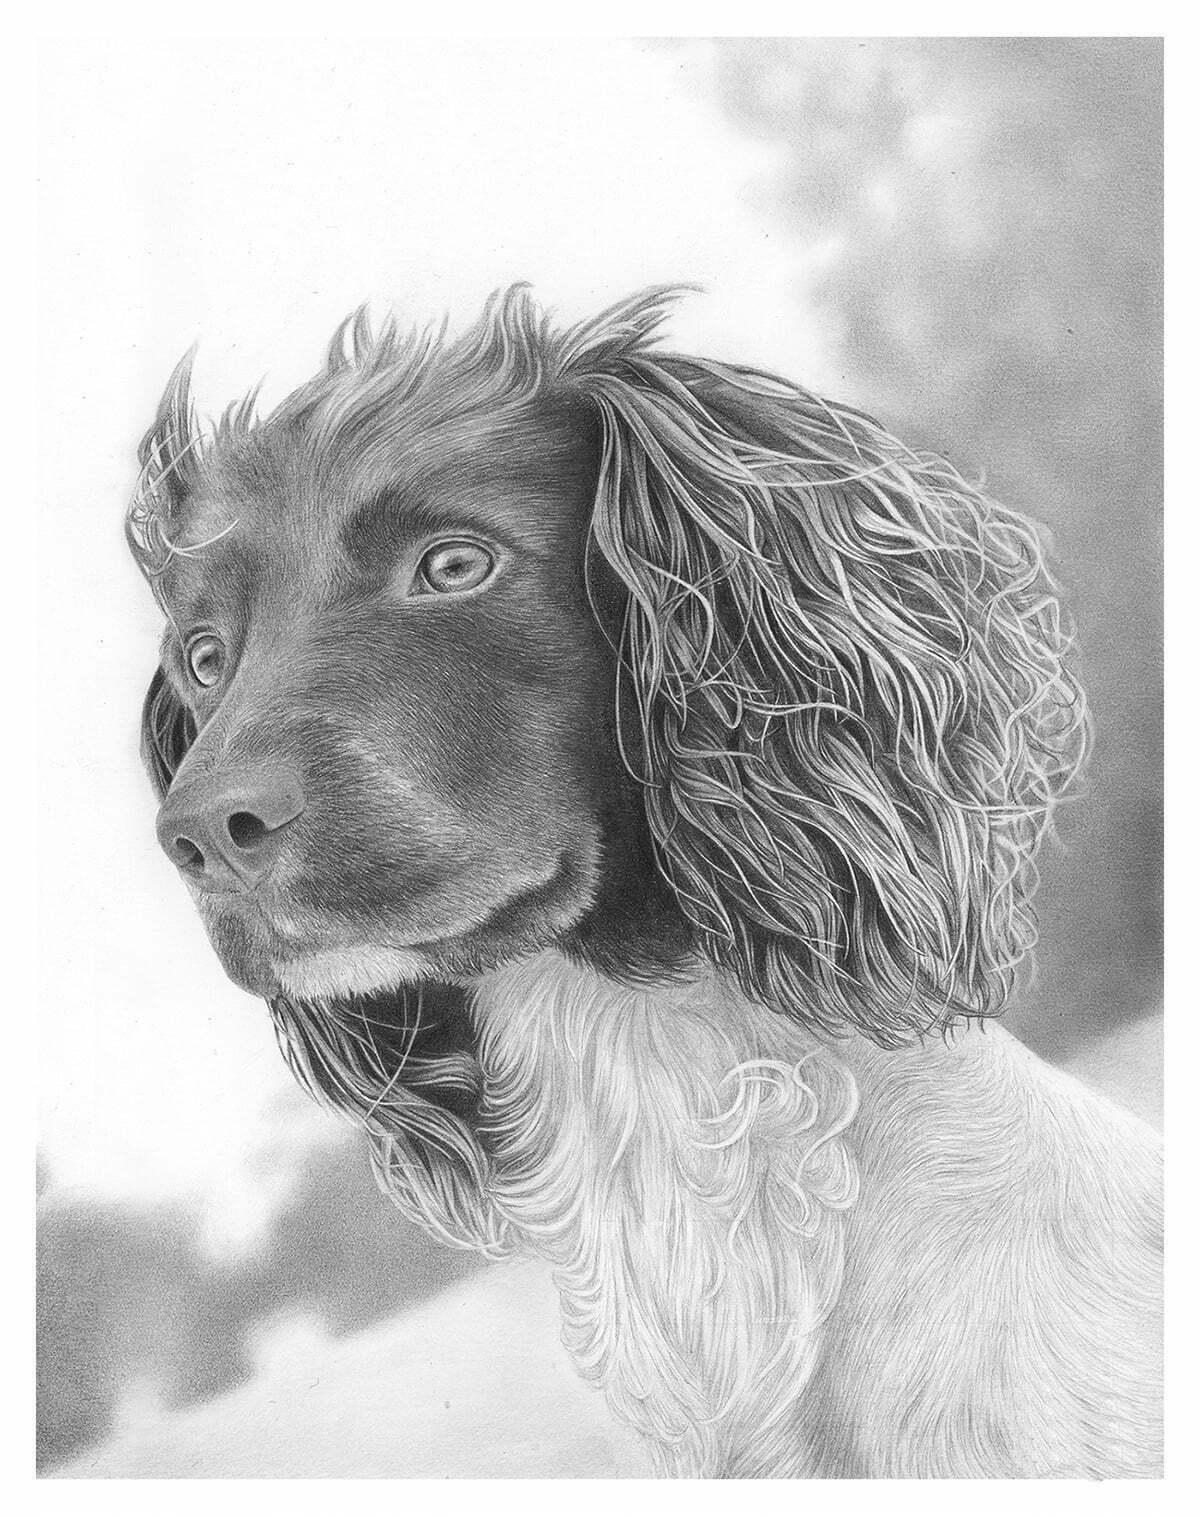 2D Dog Realistic Pencil Creature Illustration